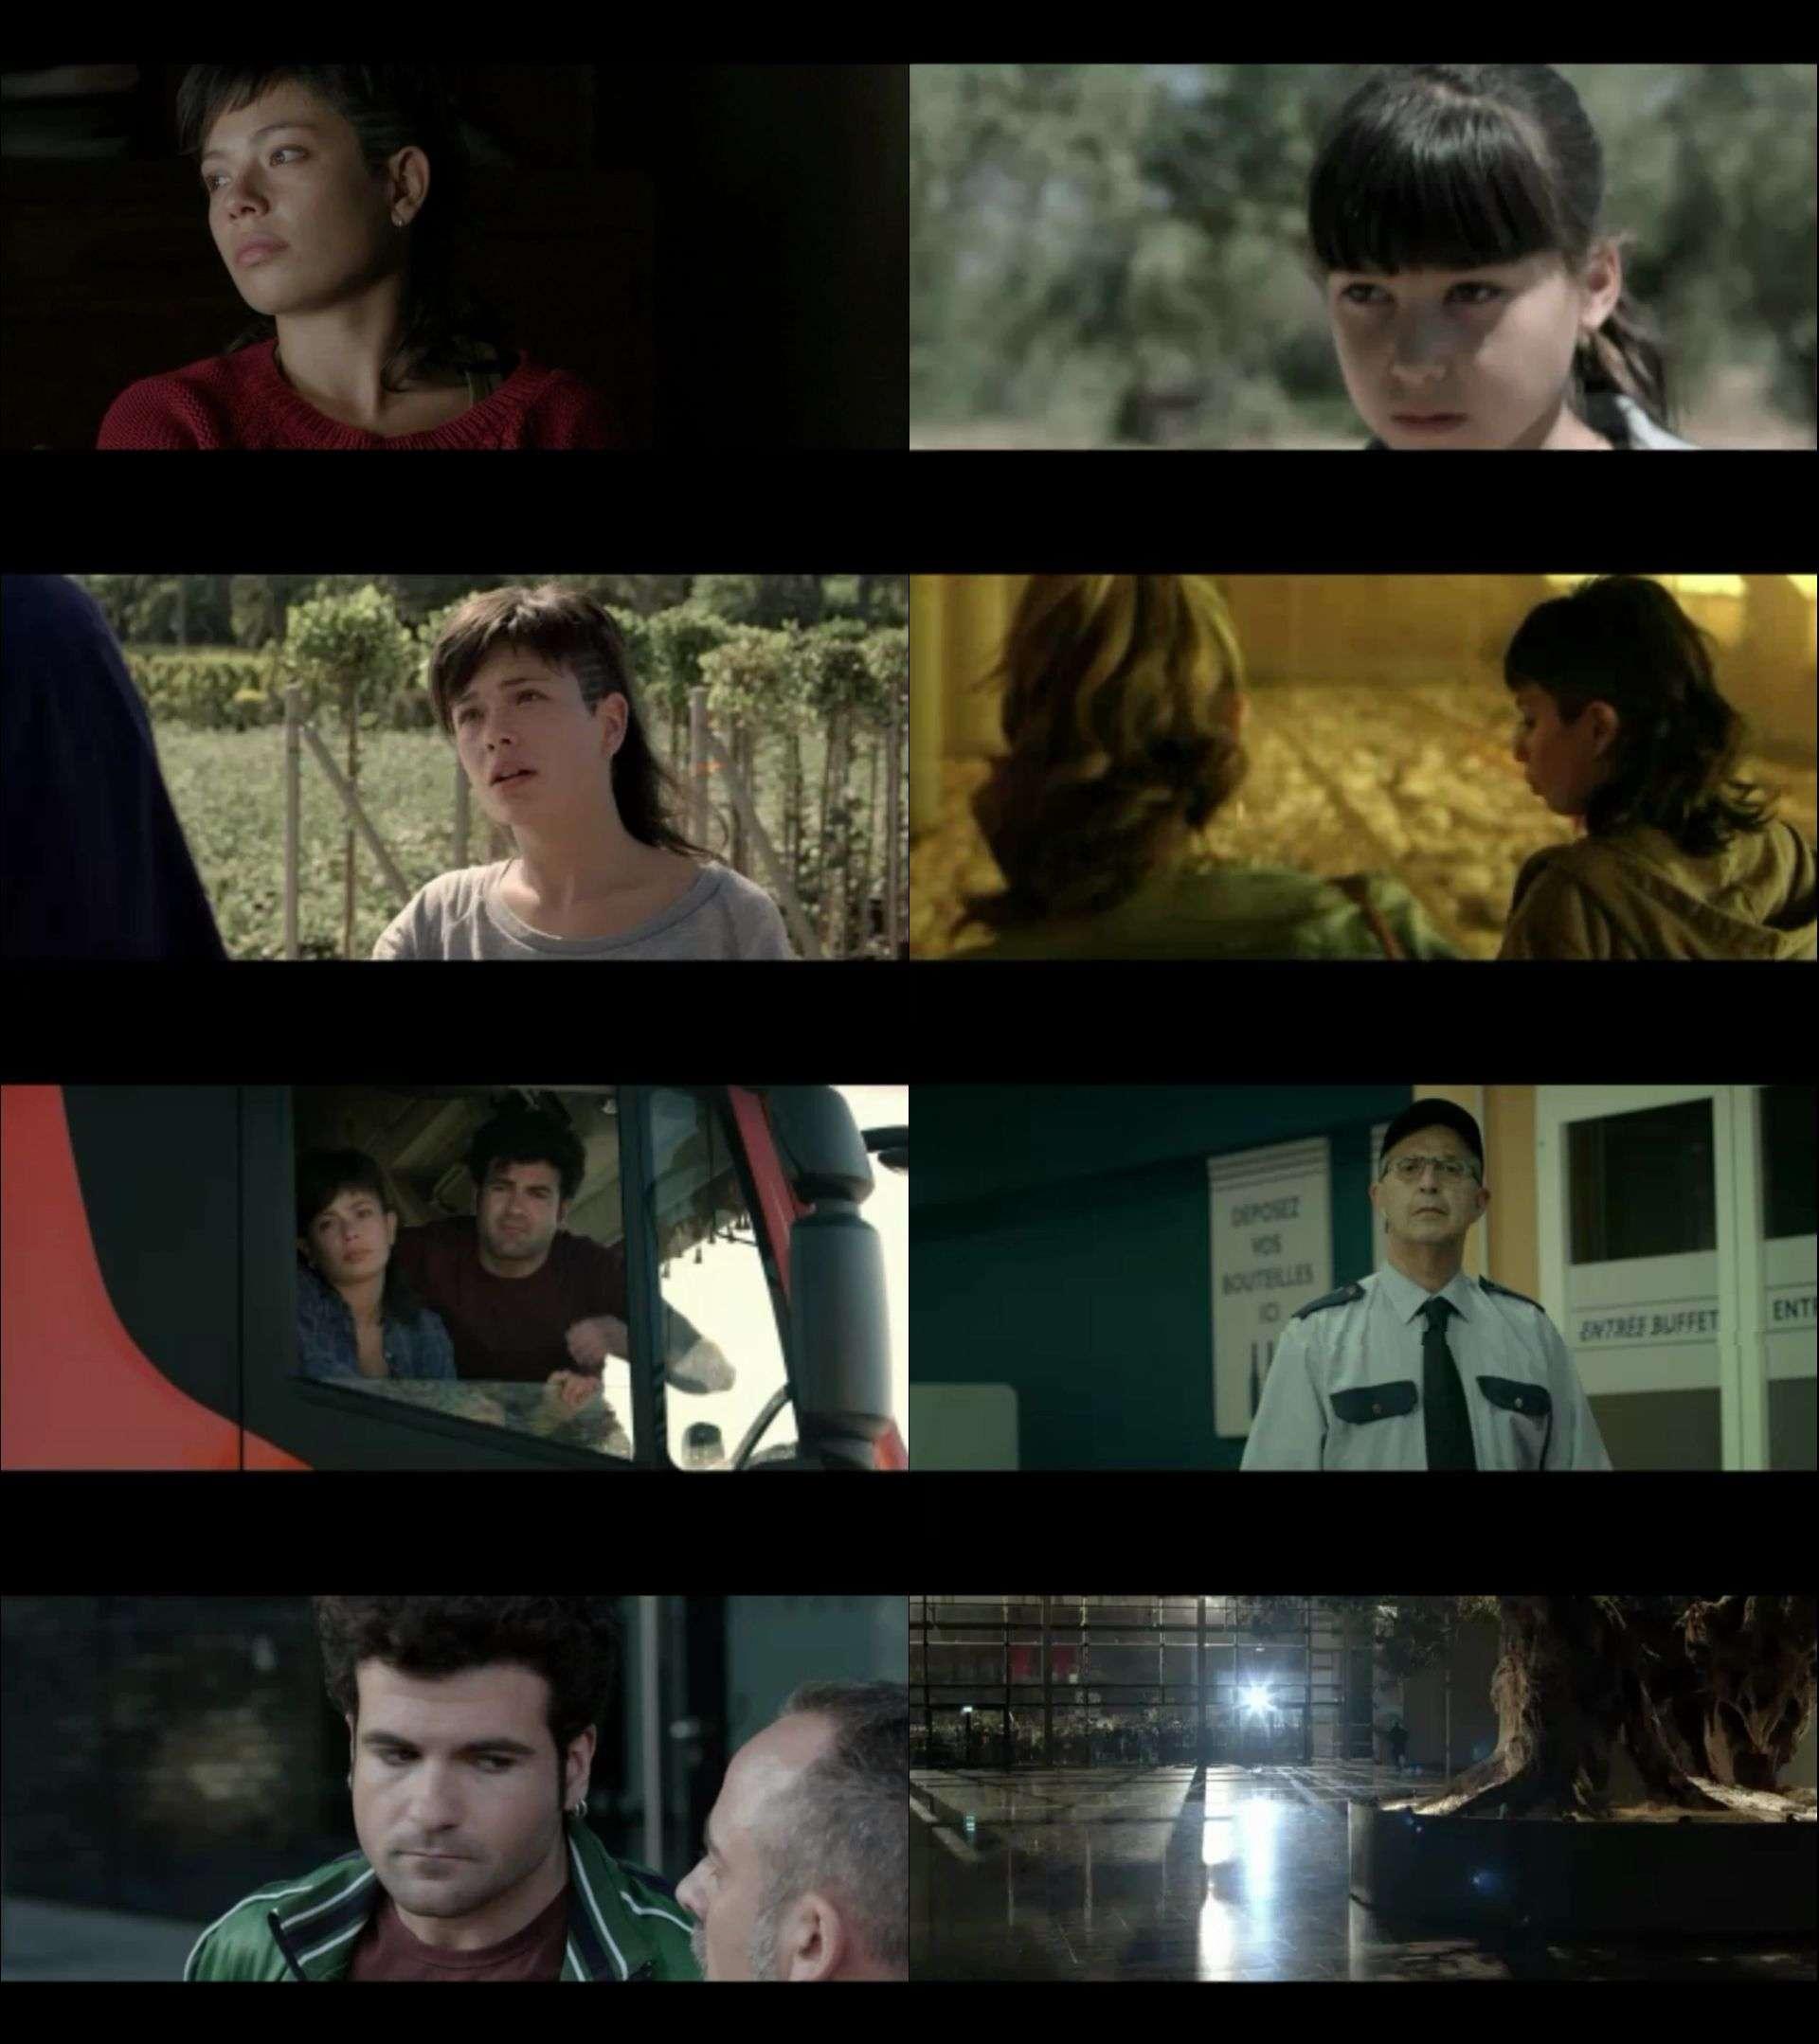 Zeytin Ağacı - The Olive Tree (2016) türkçe dublaj hd film indir